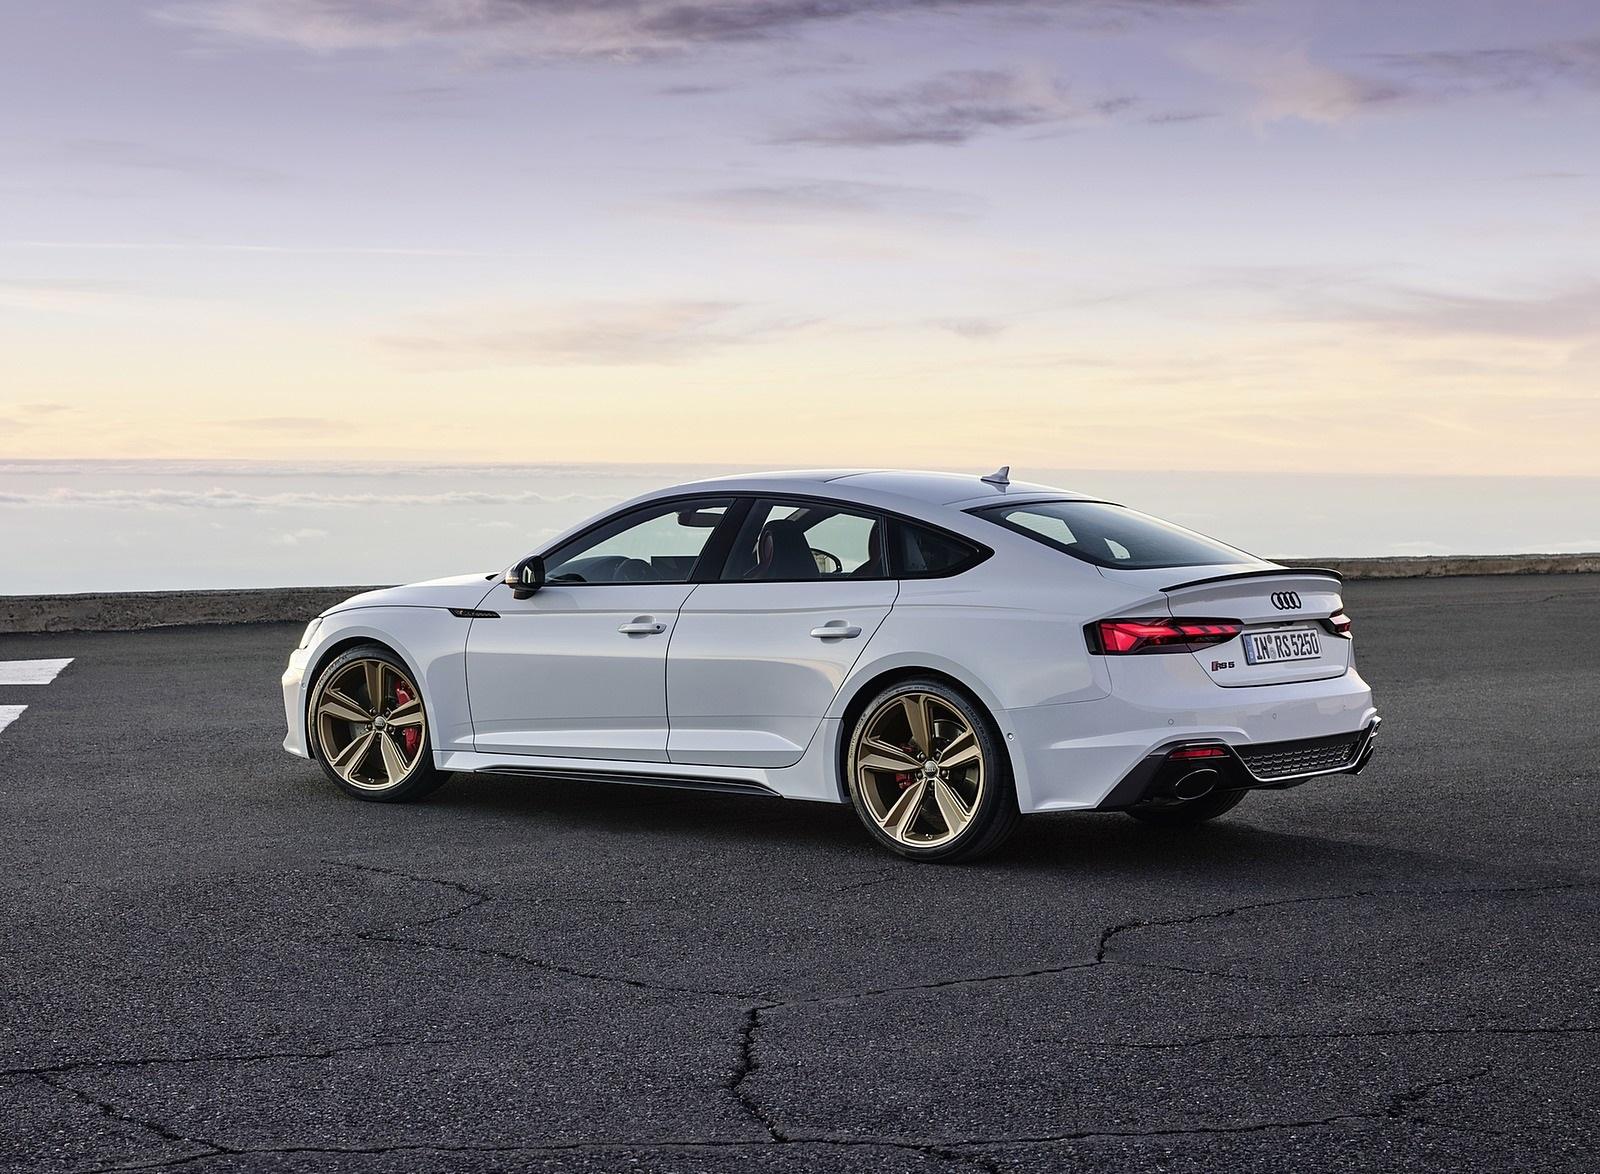 2020 Audi RS 5 Sportback (Color: Glacier White) Rear Three-Quarter Wallpapers (10)